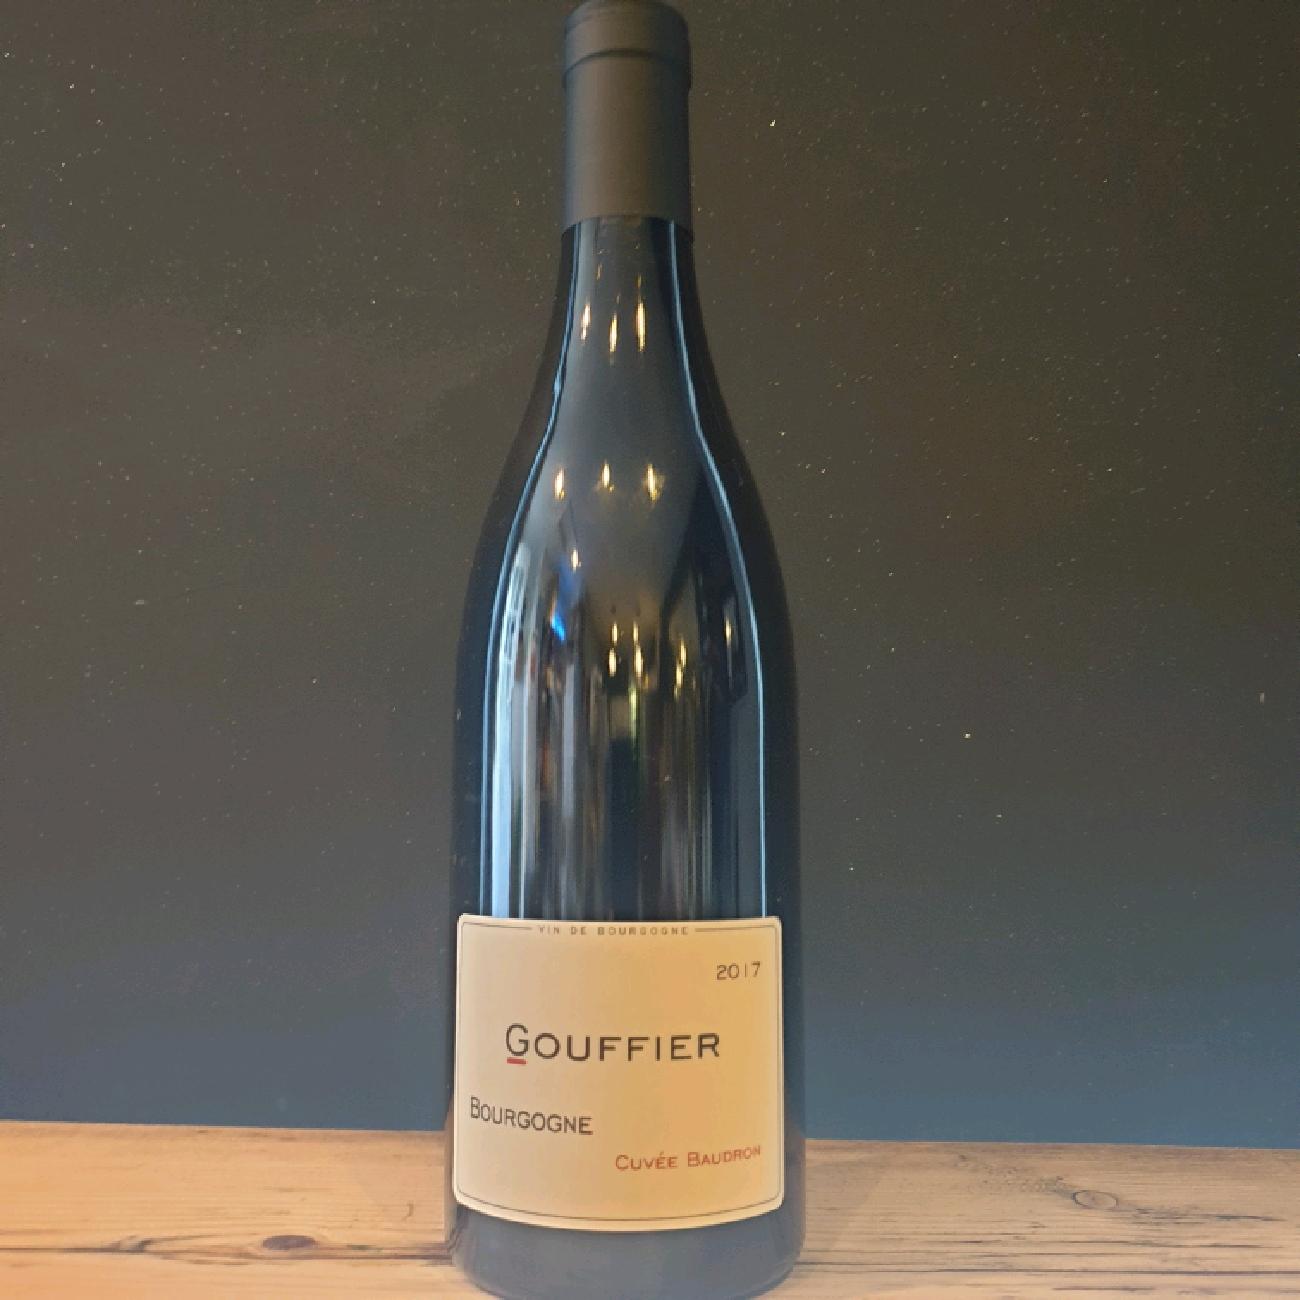 Gouffier Cuvee Baudron, Bourgogne Rouge